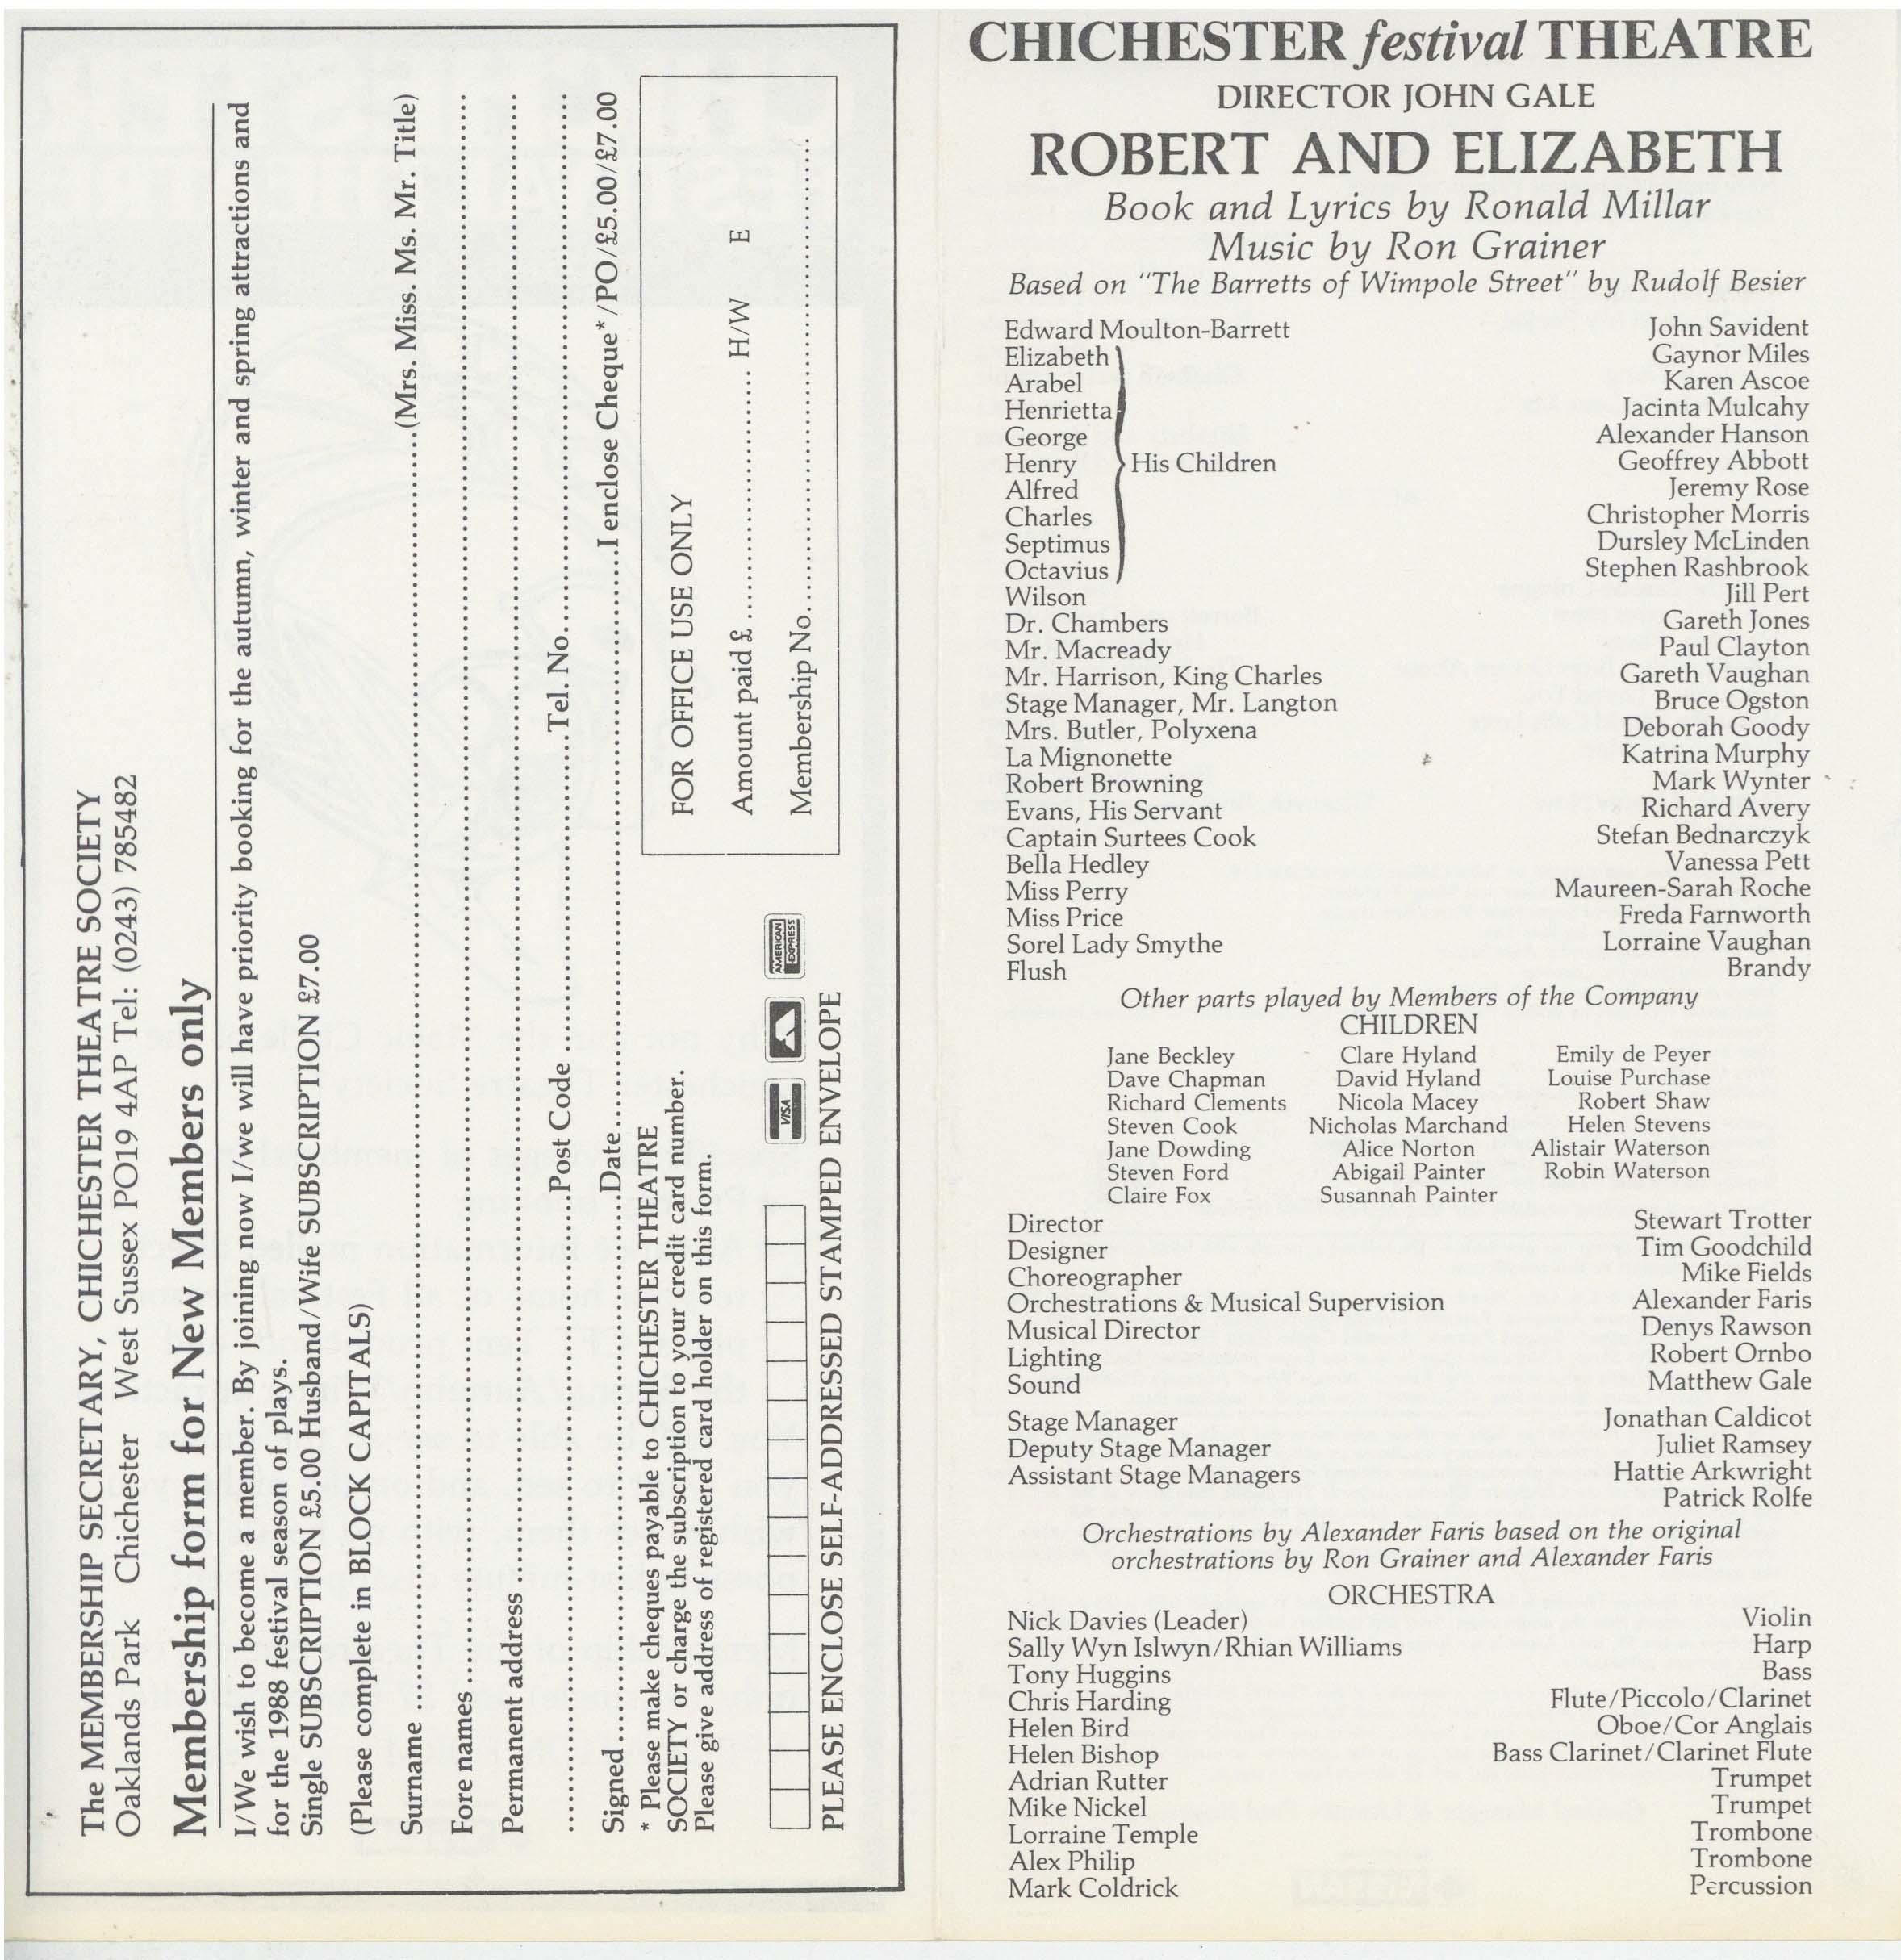 Cast List - Robert And Elizabeth - 1987 - 2 of 2